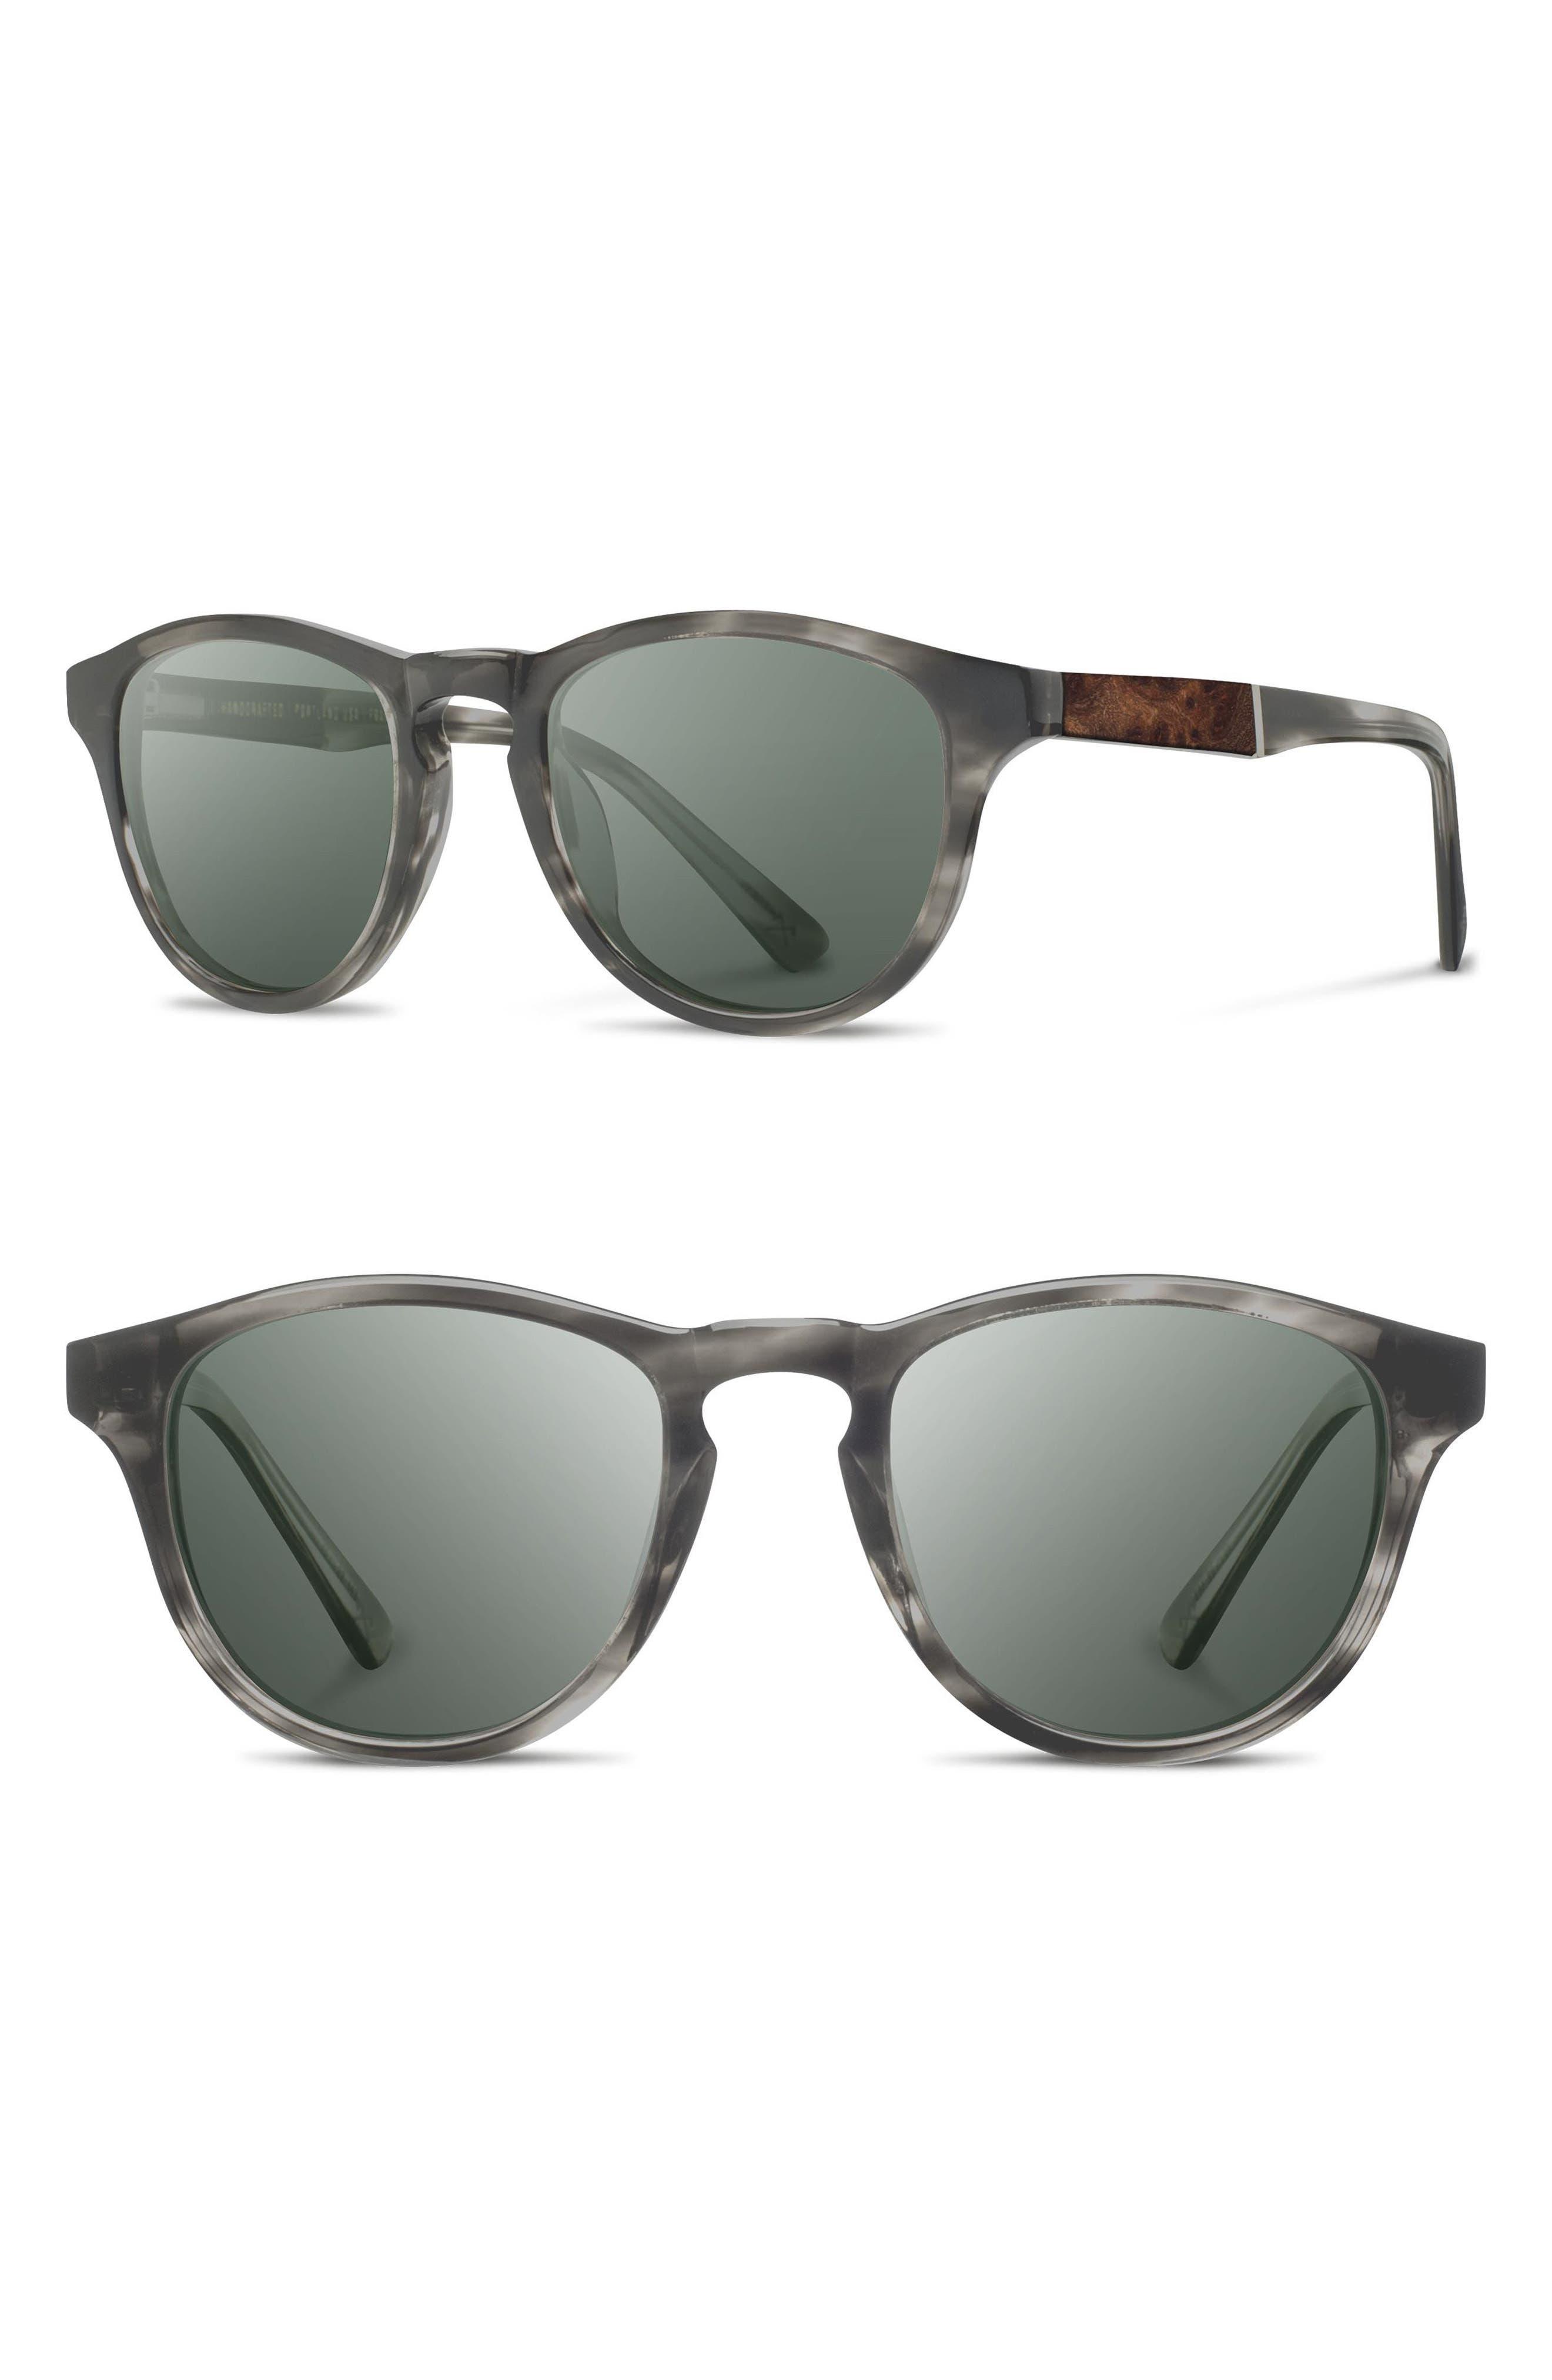 'Francis' 49mm Polarized Sunglasses,                             Main thumbnail 1, color,                             Matte Grey/ Elm/ G15p